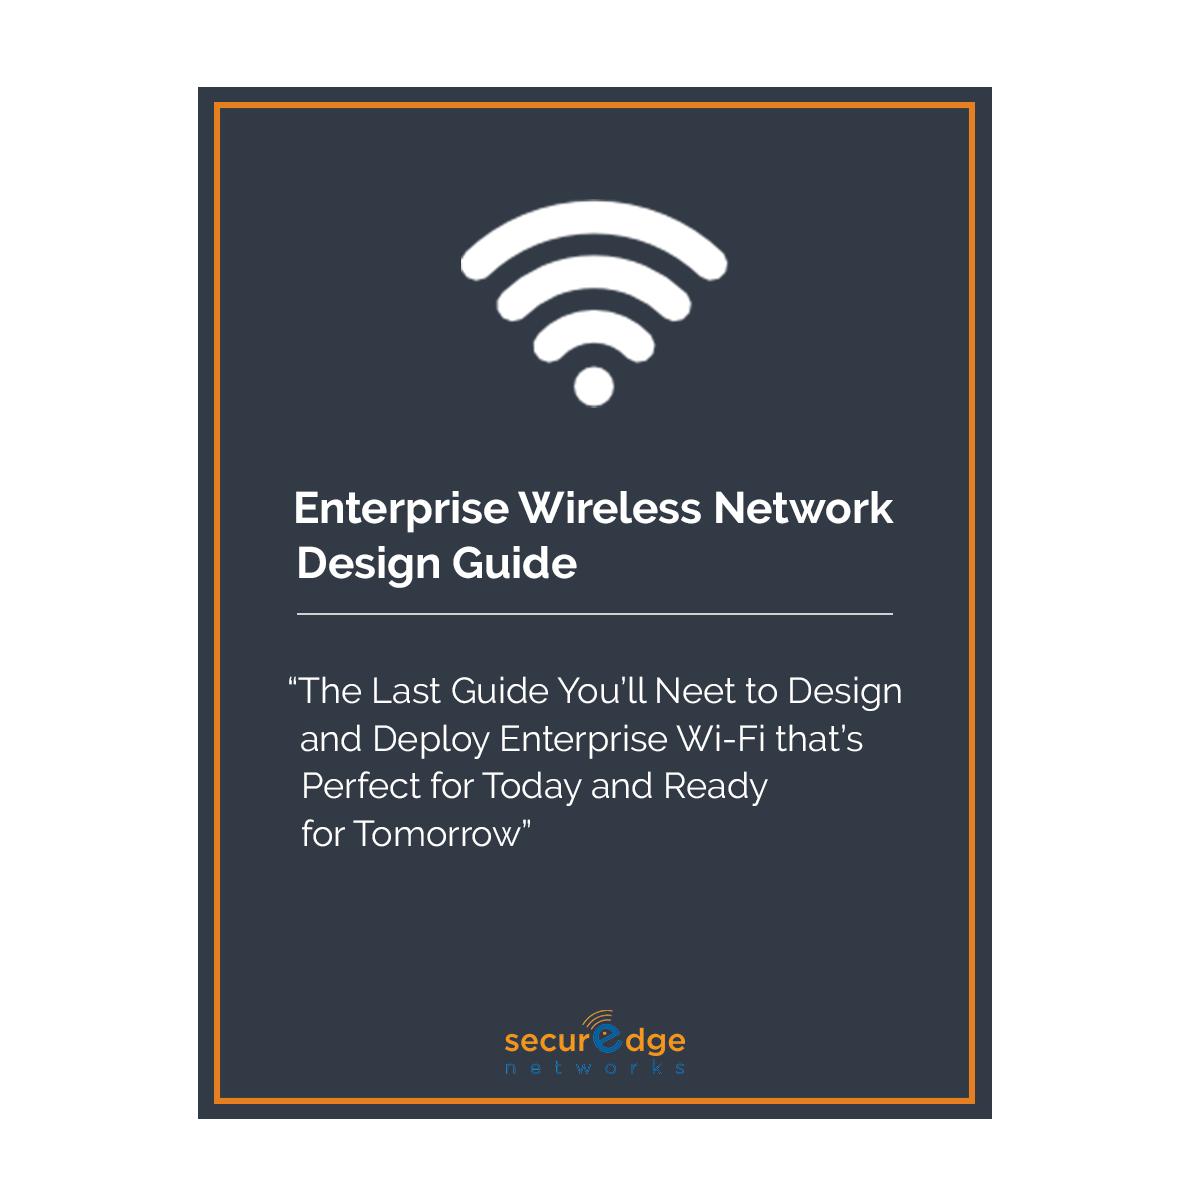 Enterprise Wireless Network Design Guide